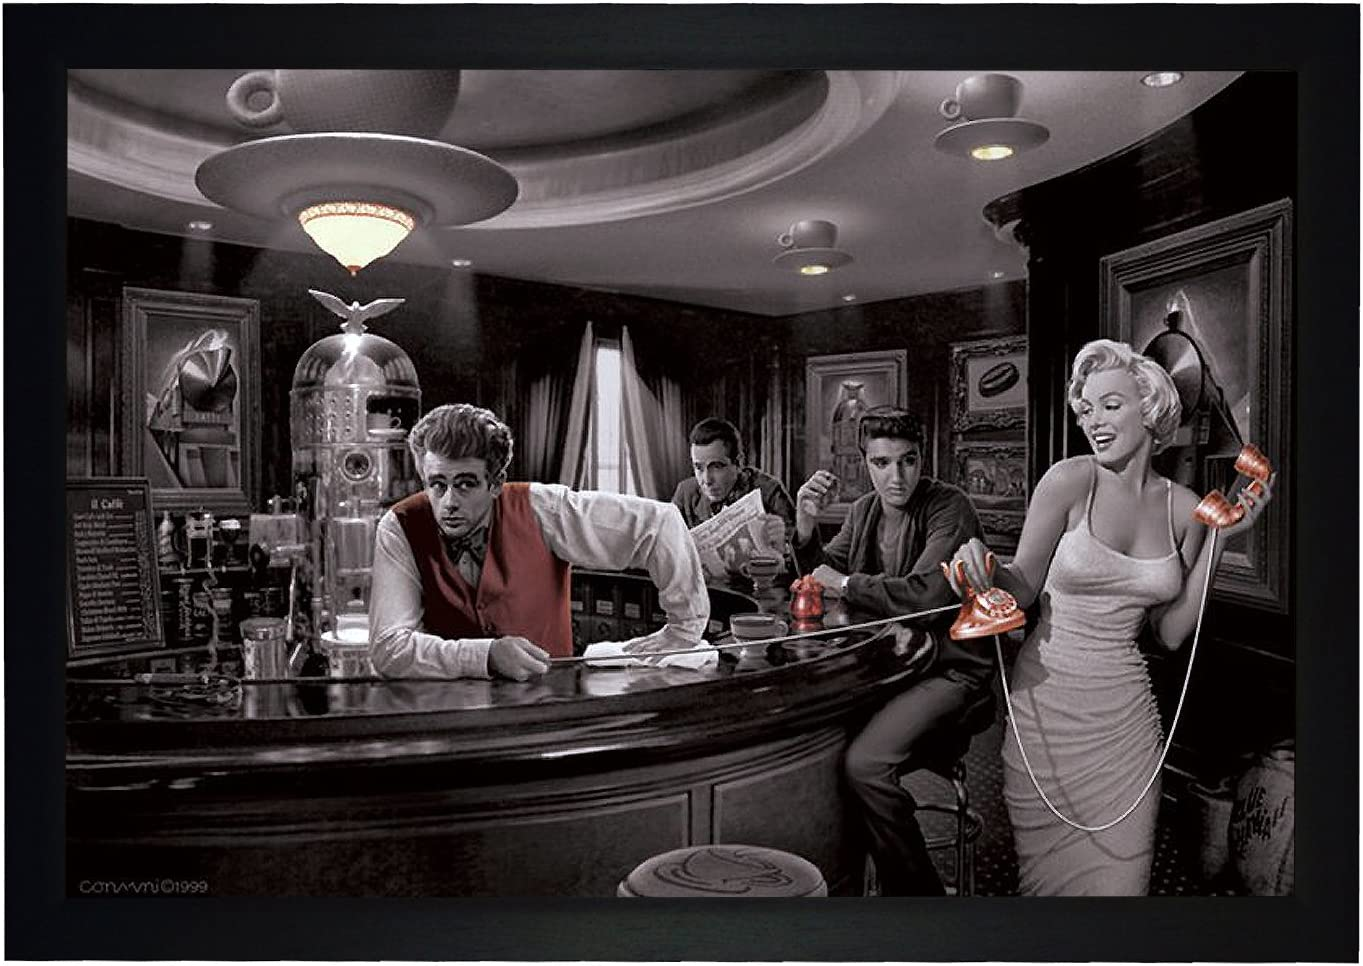 Chris Consani Love/'s Return Marilyn Monroe Elvis Presley Print Poster 11×14